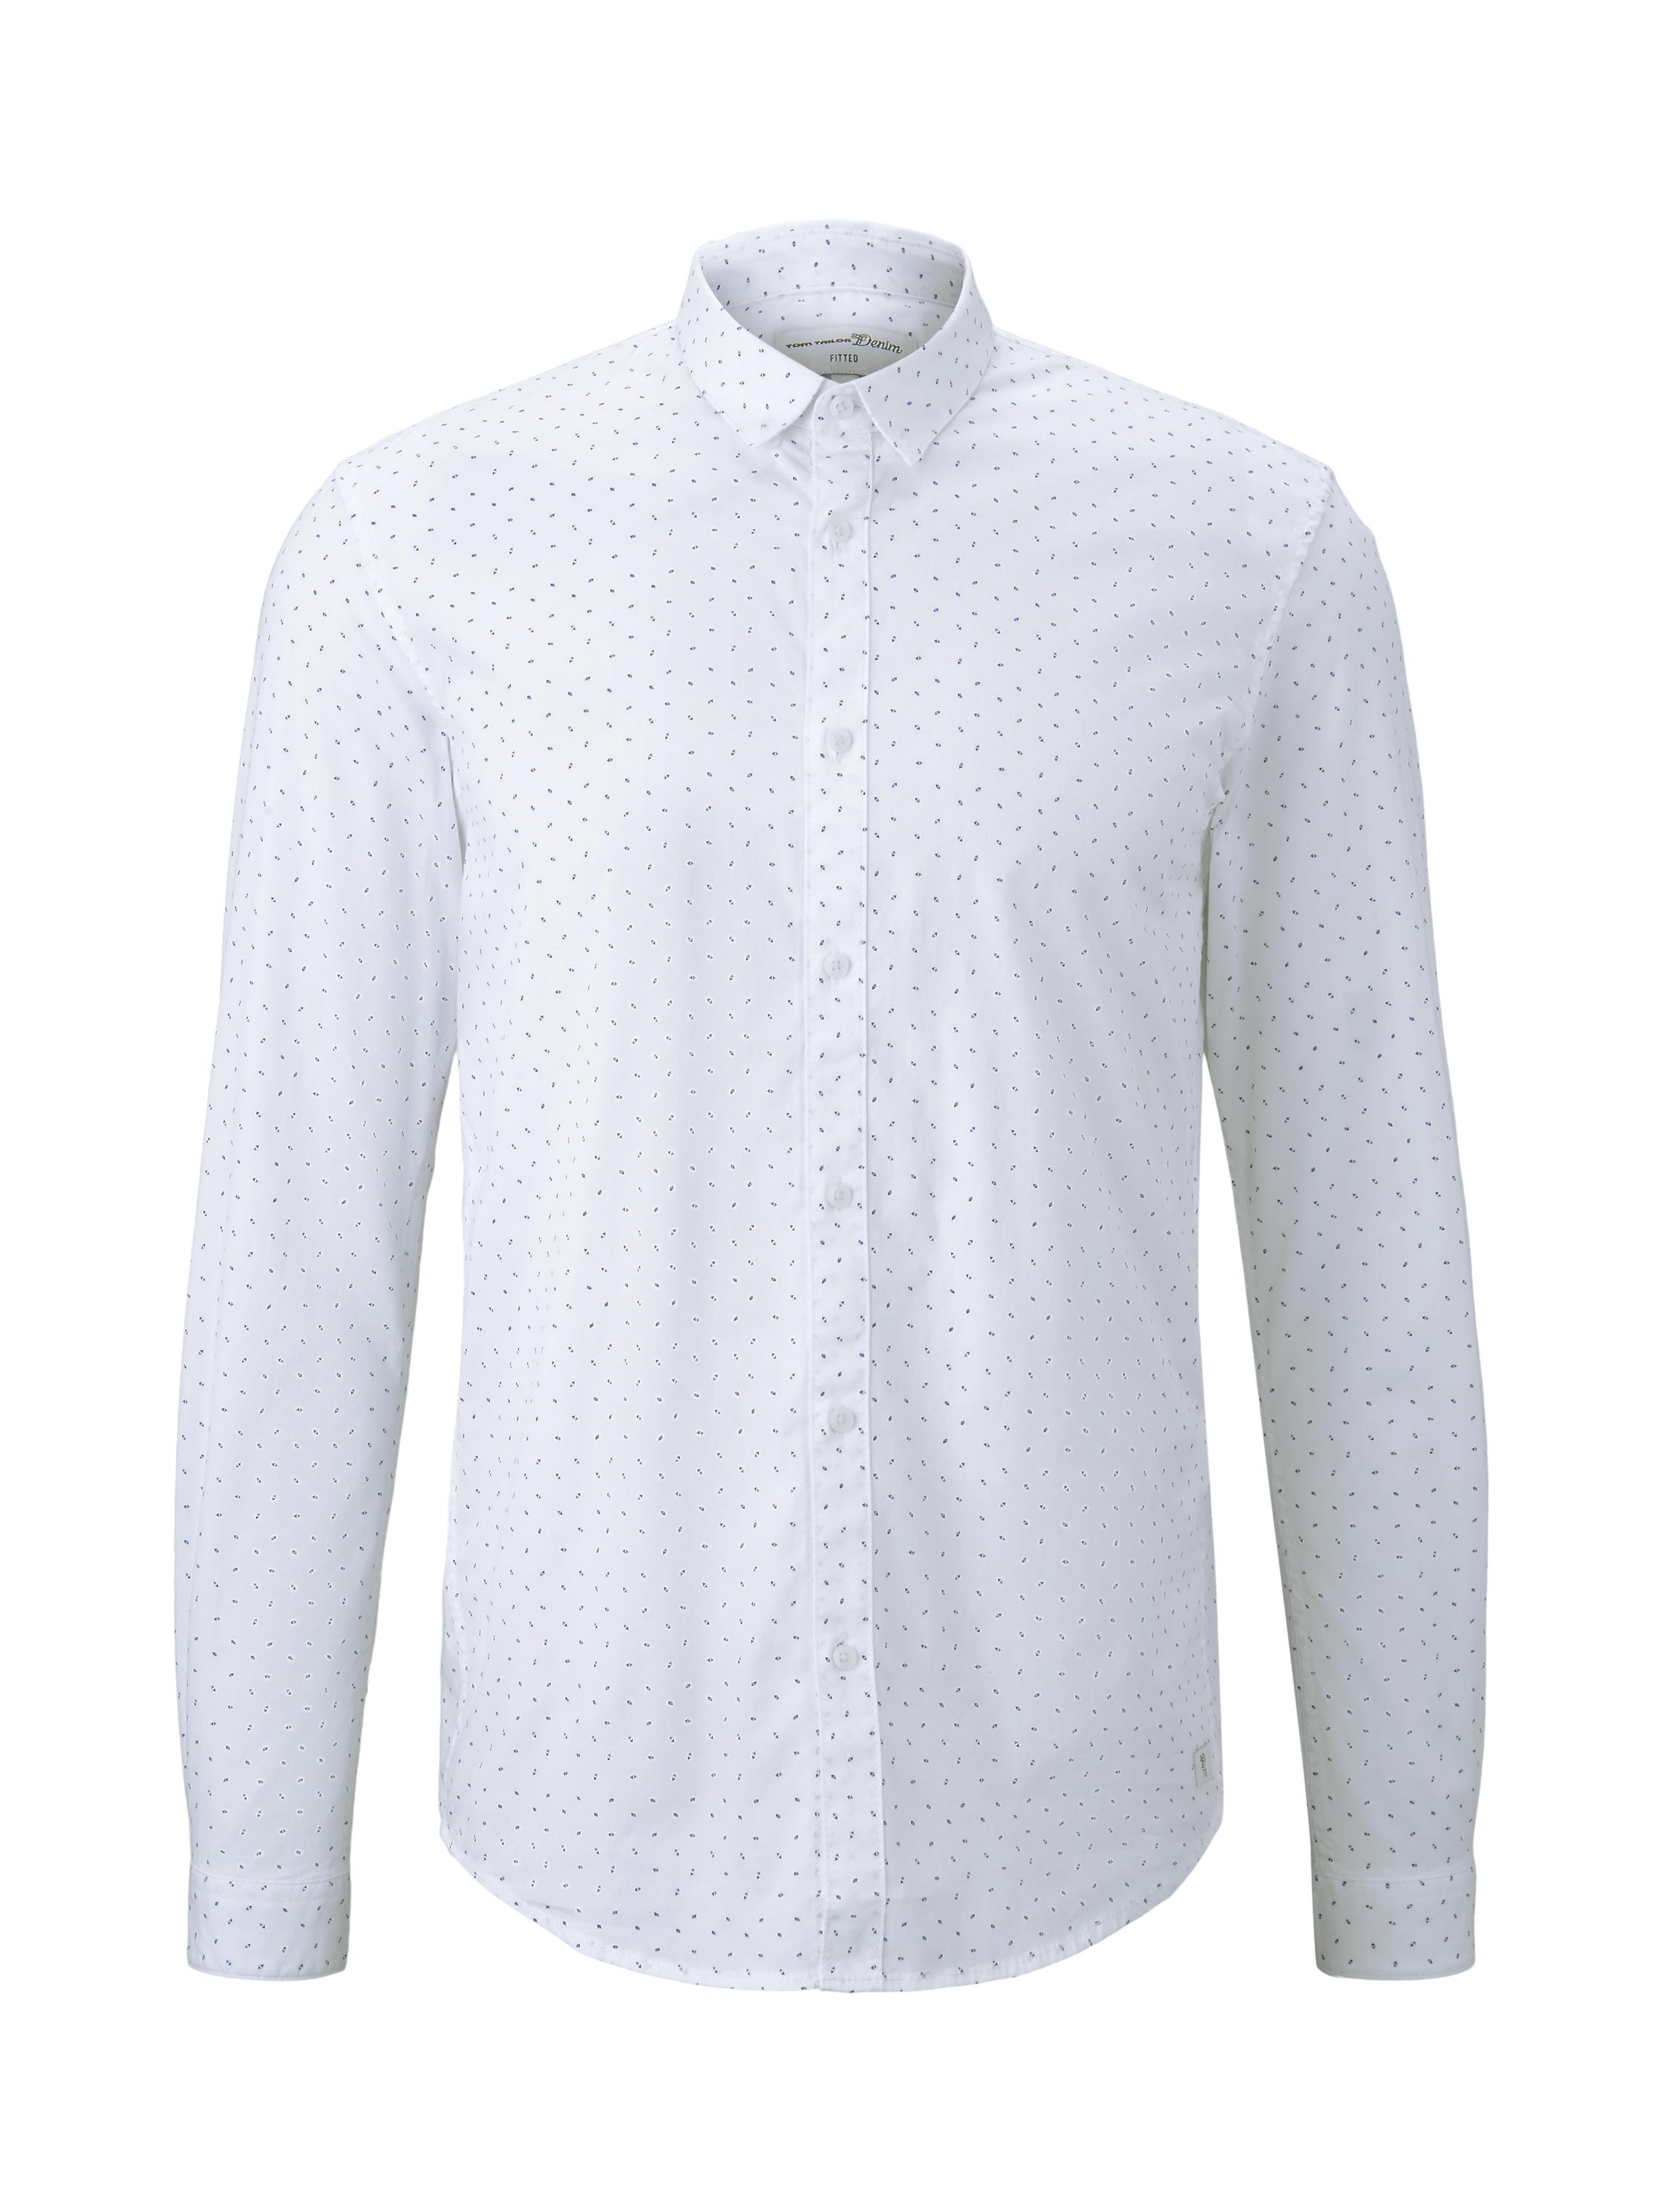 allover printed stretch shirt, white small triangle print